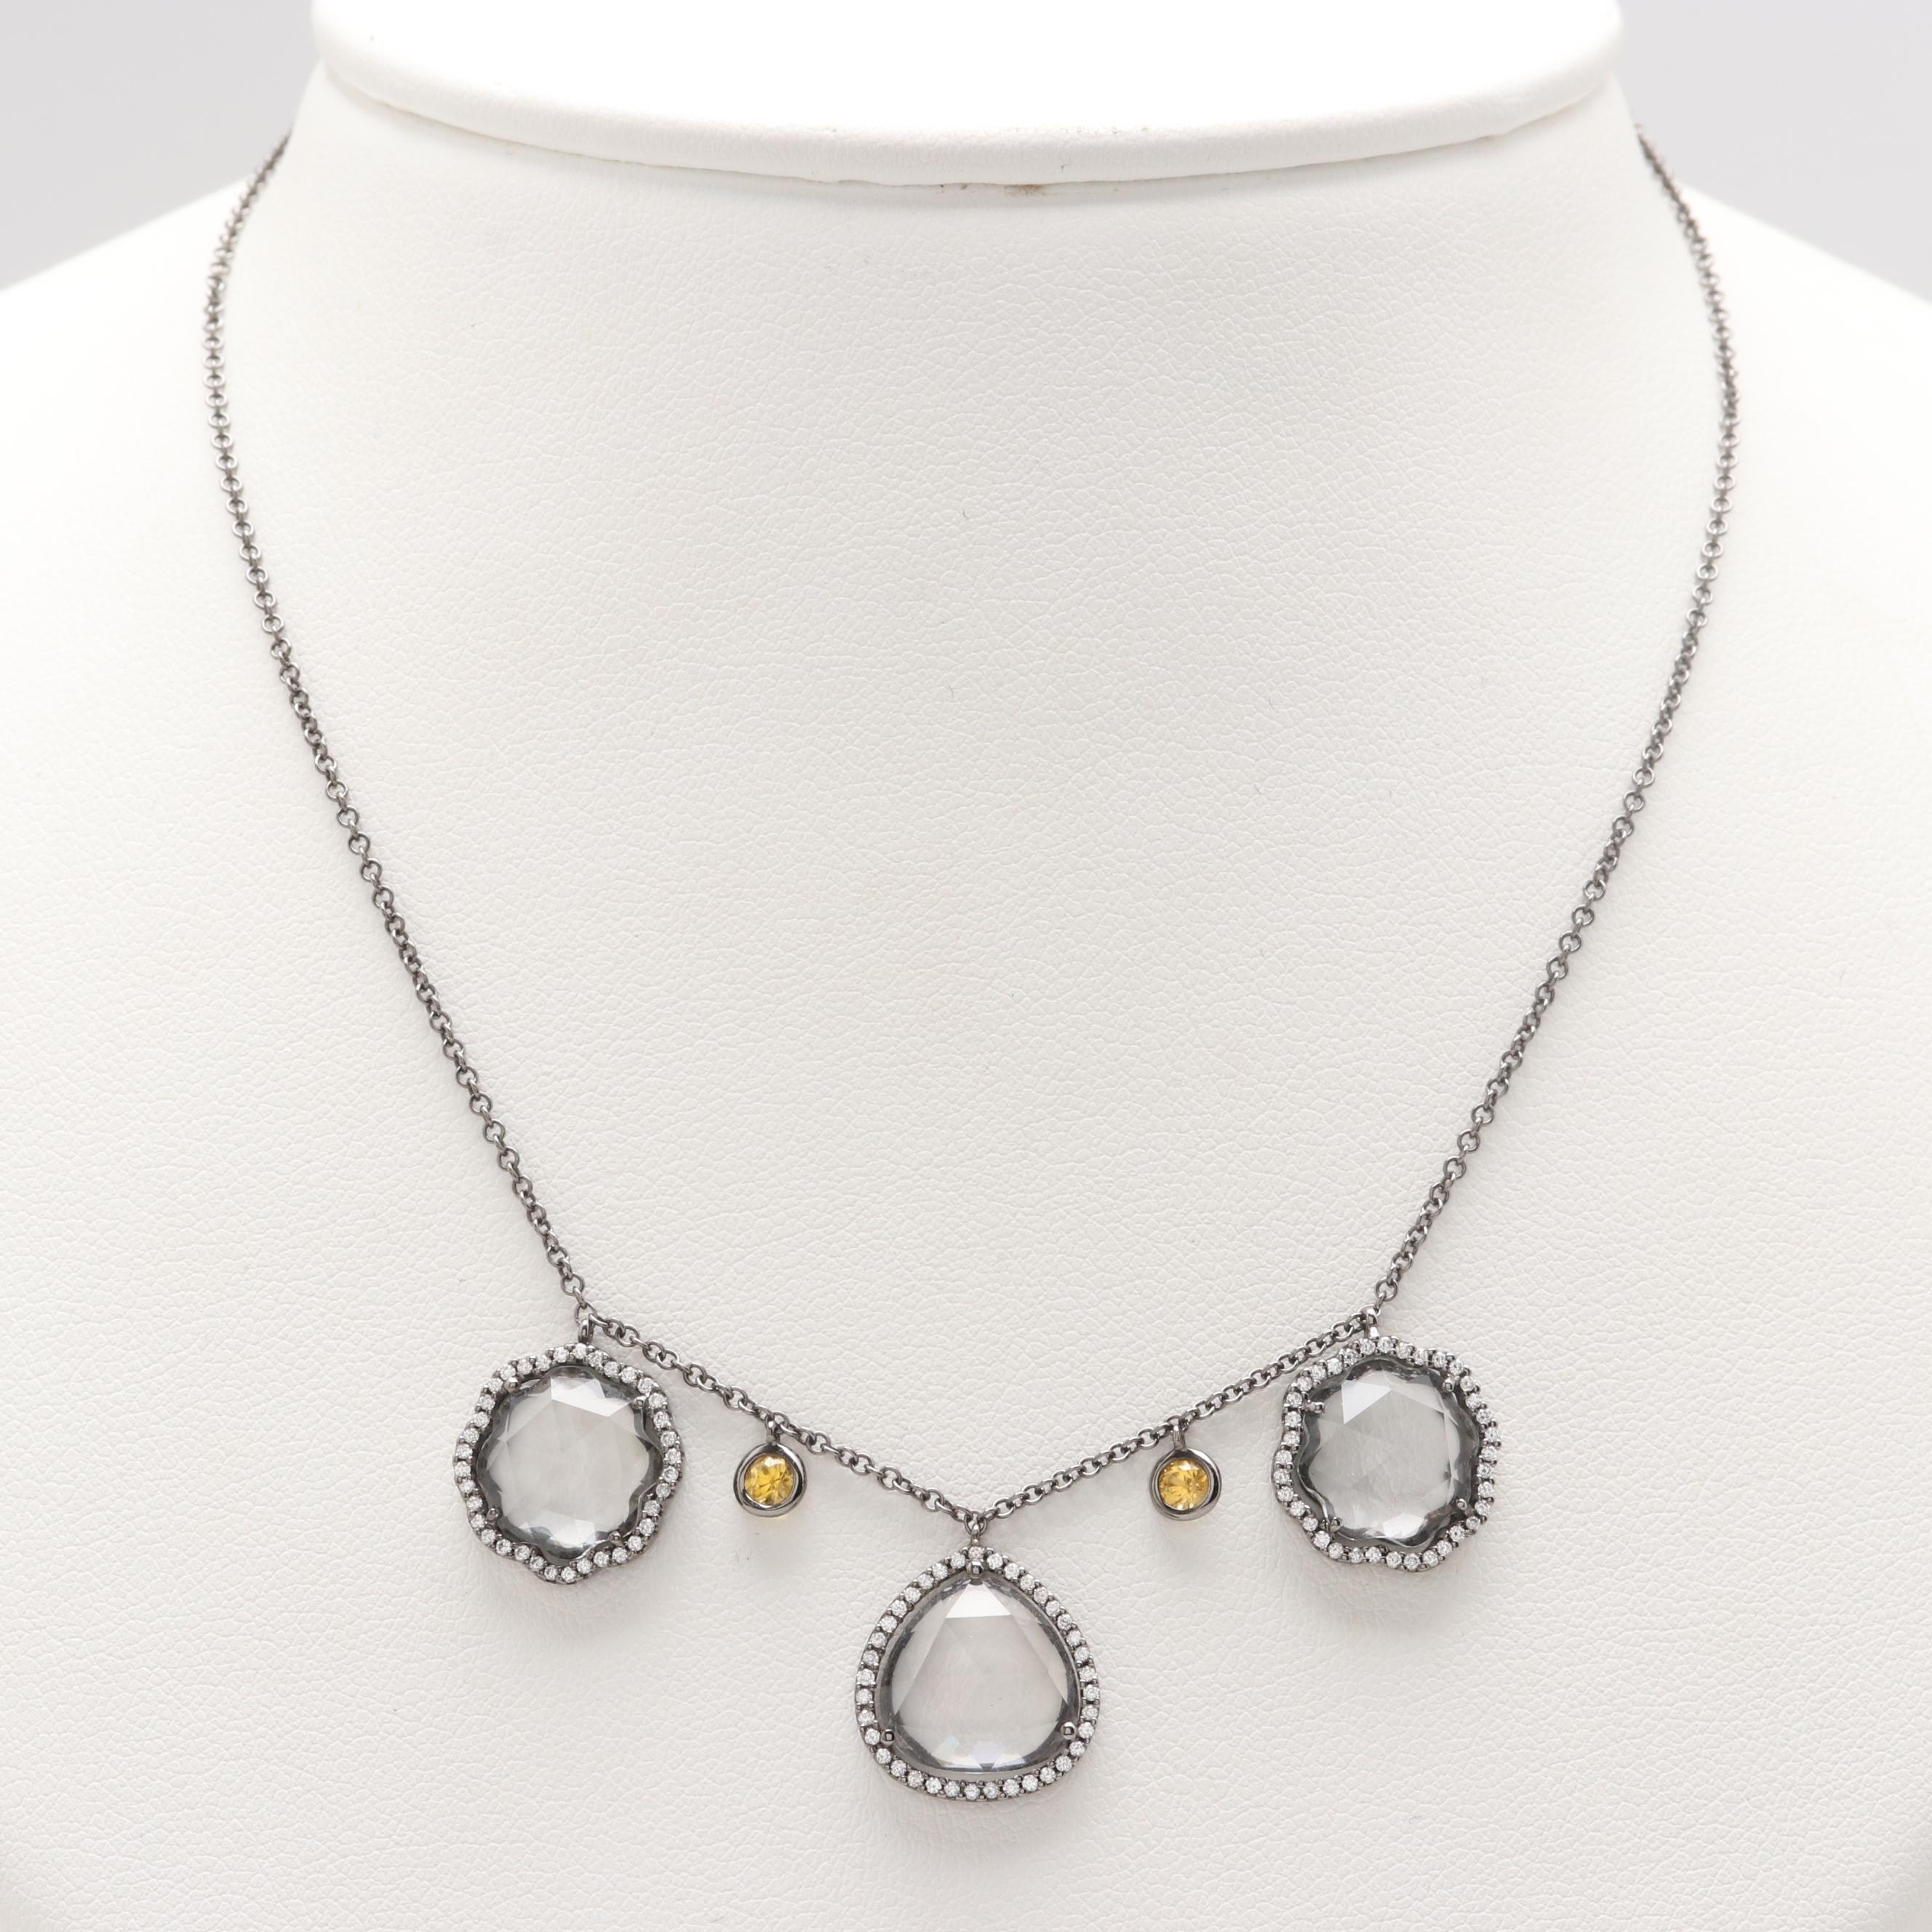 18K White Gold White Topaz, Topaz and Diamond Necklace